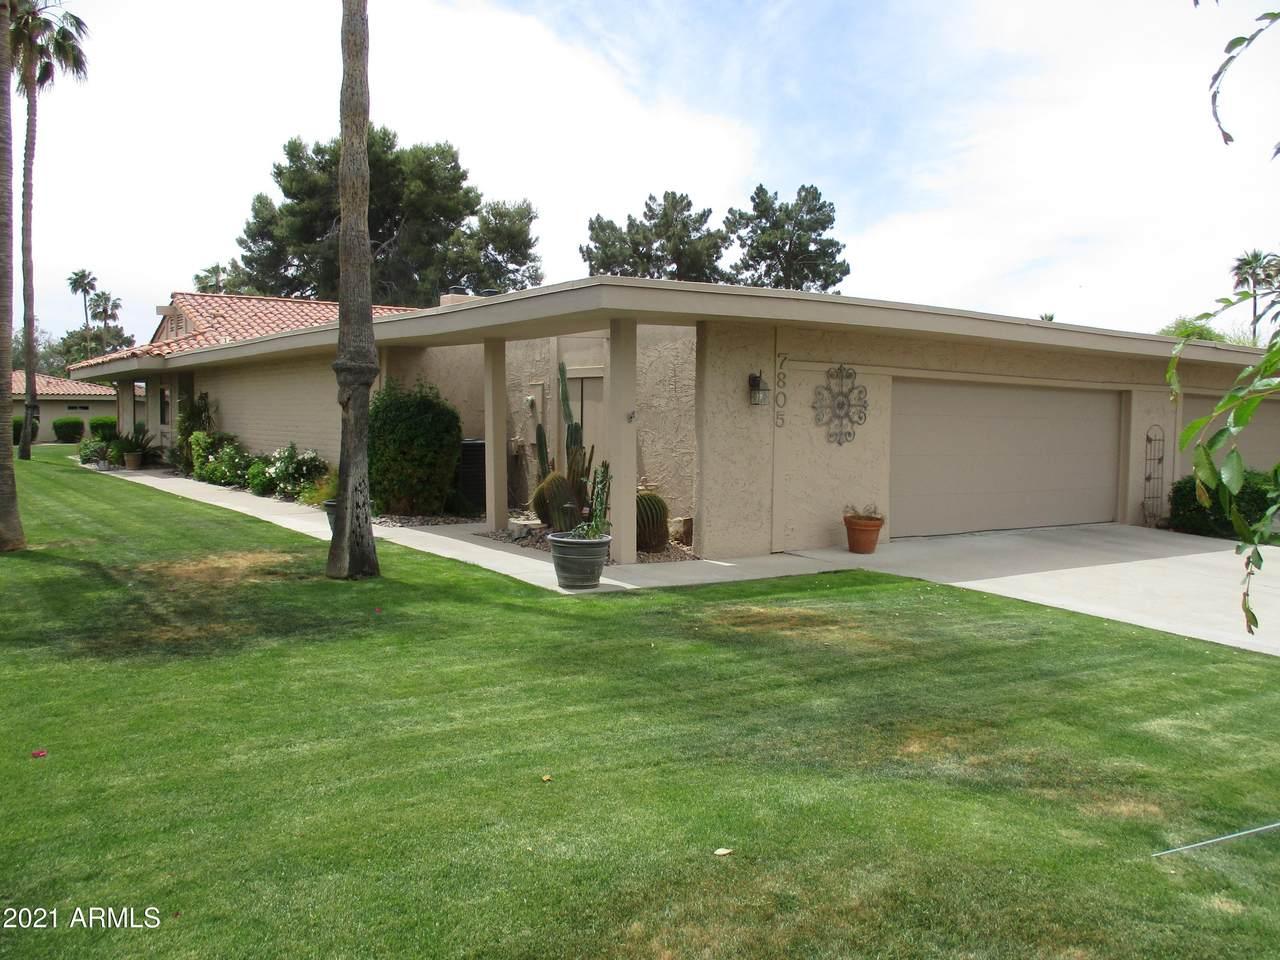 7805 San Carlos Road - Photo 1